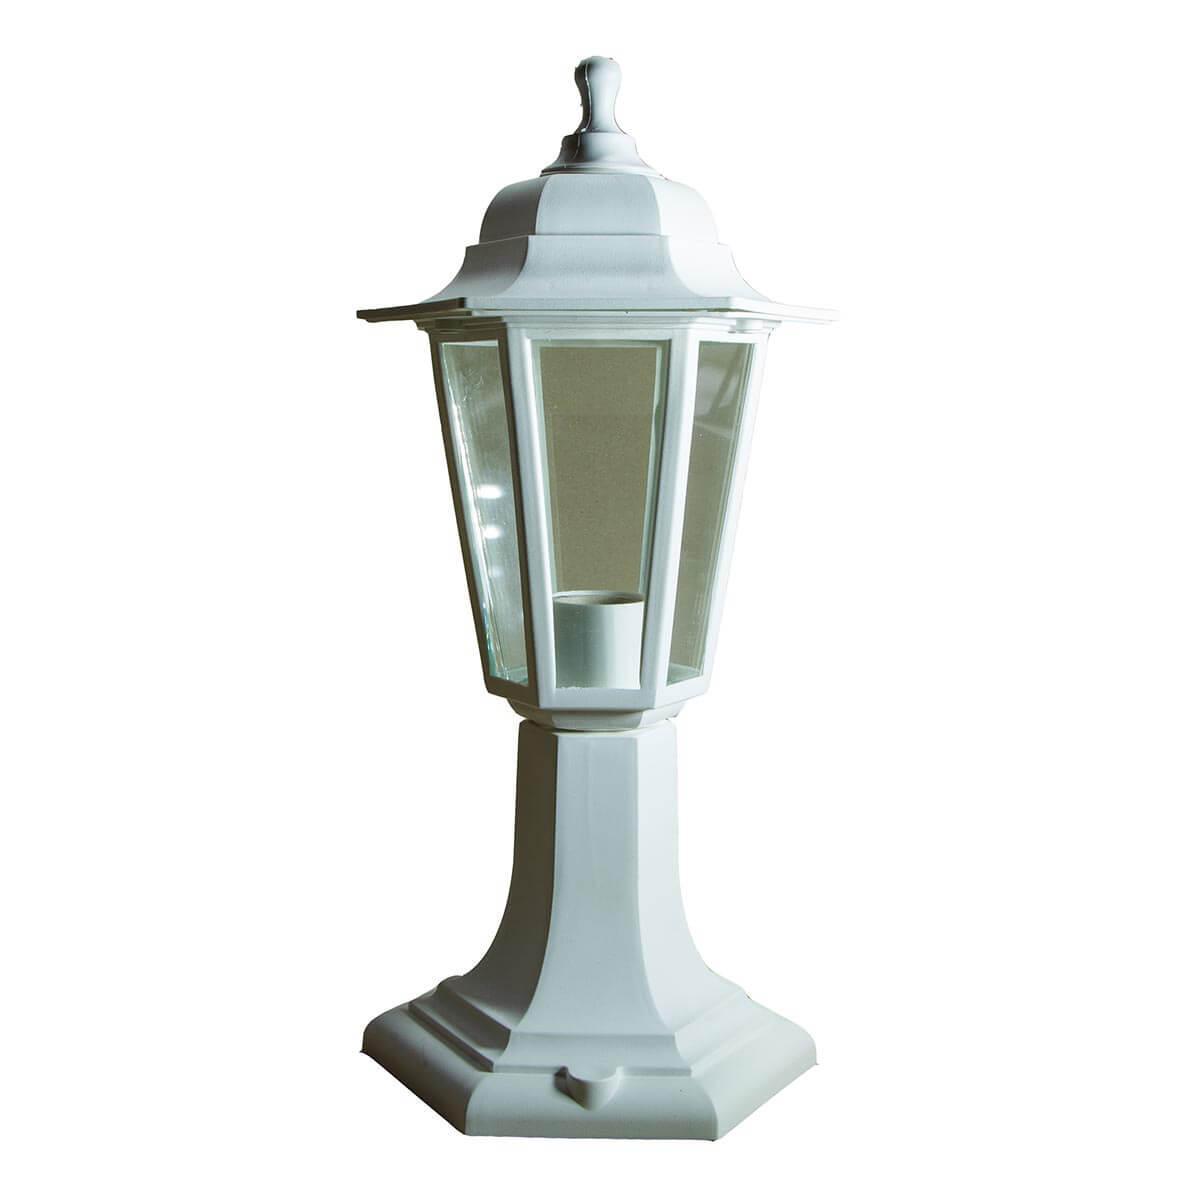 Уличный светильник ЭРА Оскар белый НТУ 06-60-001 Б0048104